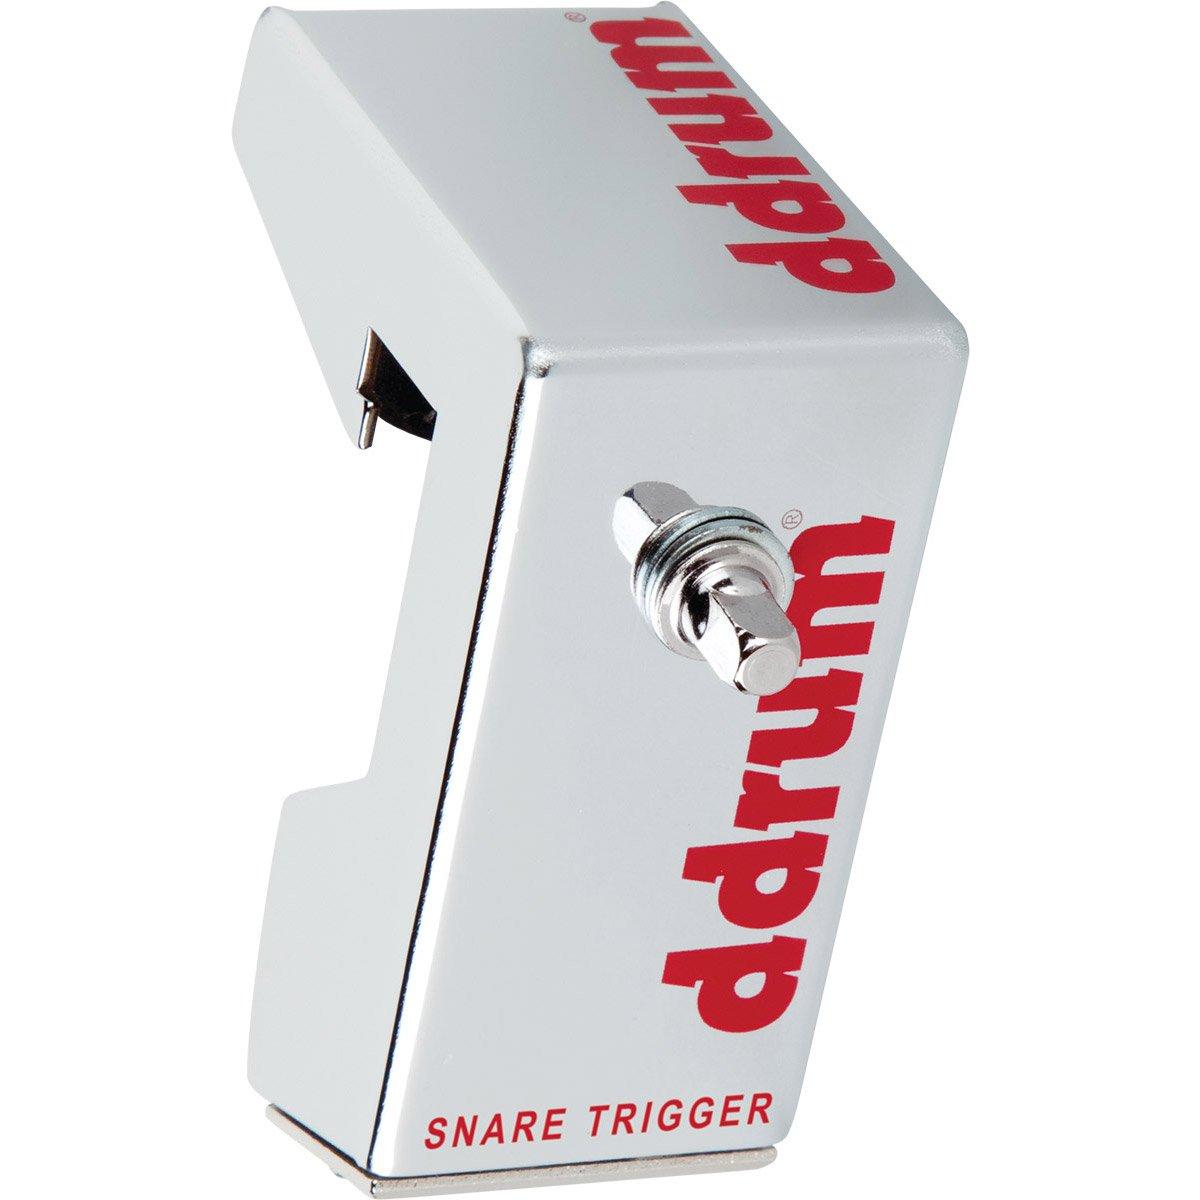 ddrum CEDTS Chrome Elite Dual Snare Trigger